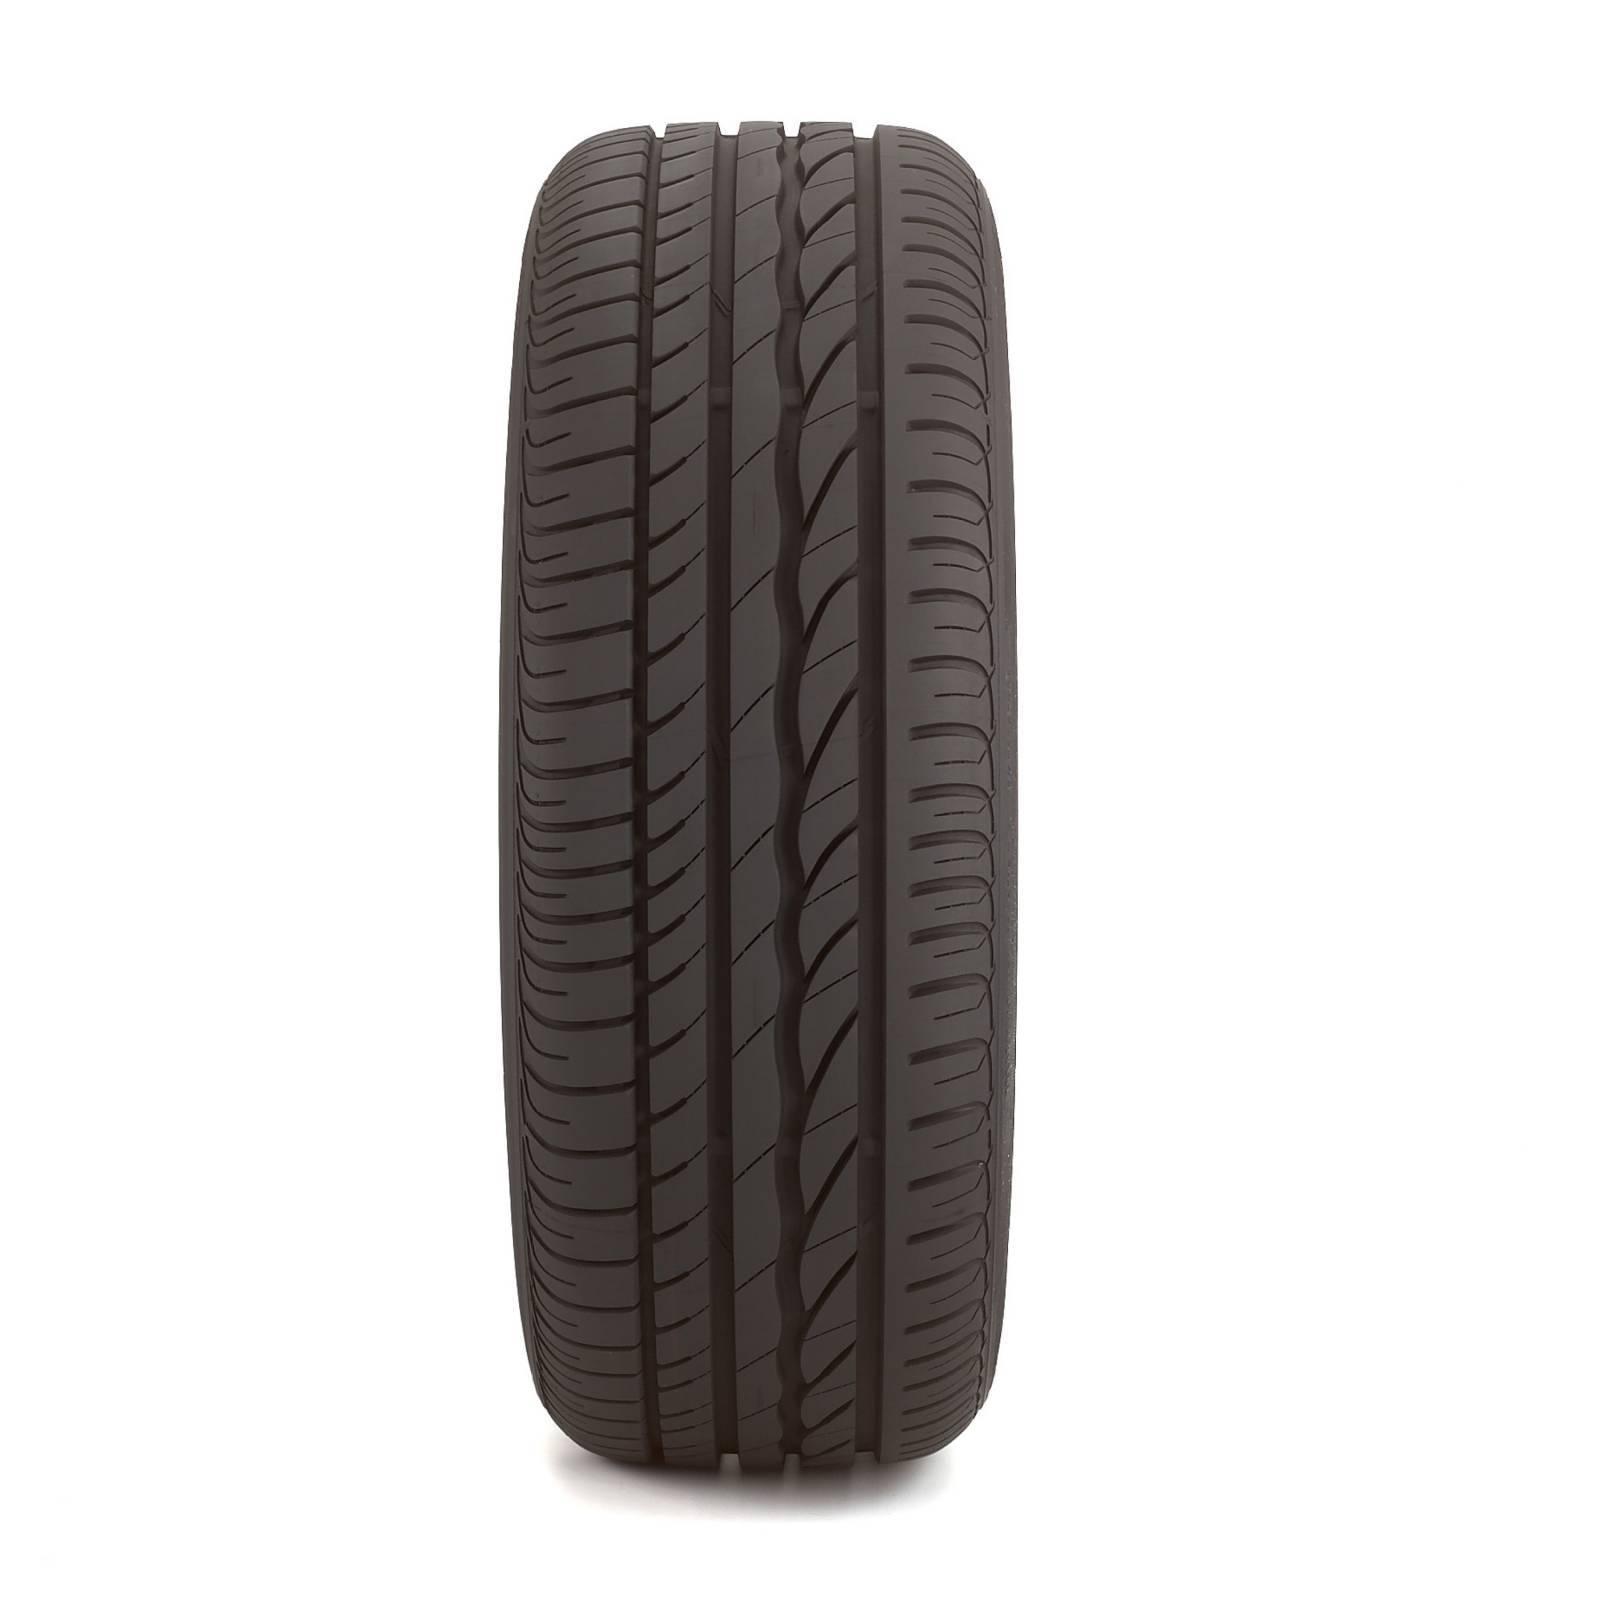 Pneu Bridgestone Turanza ER300 195/60 R16 89H - Cantele Centro Automotivo